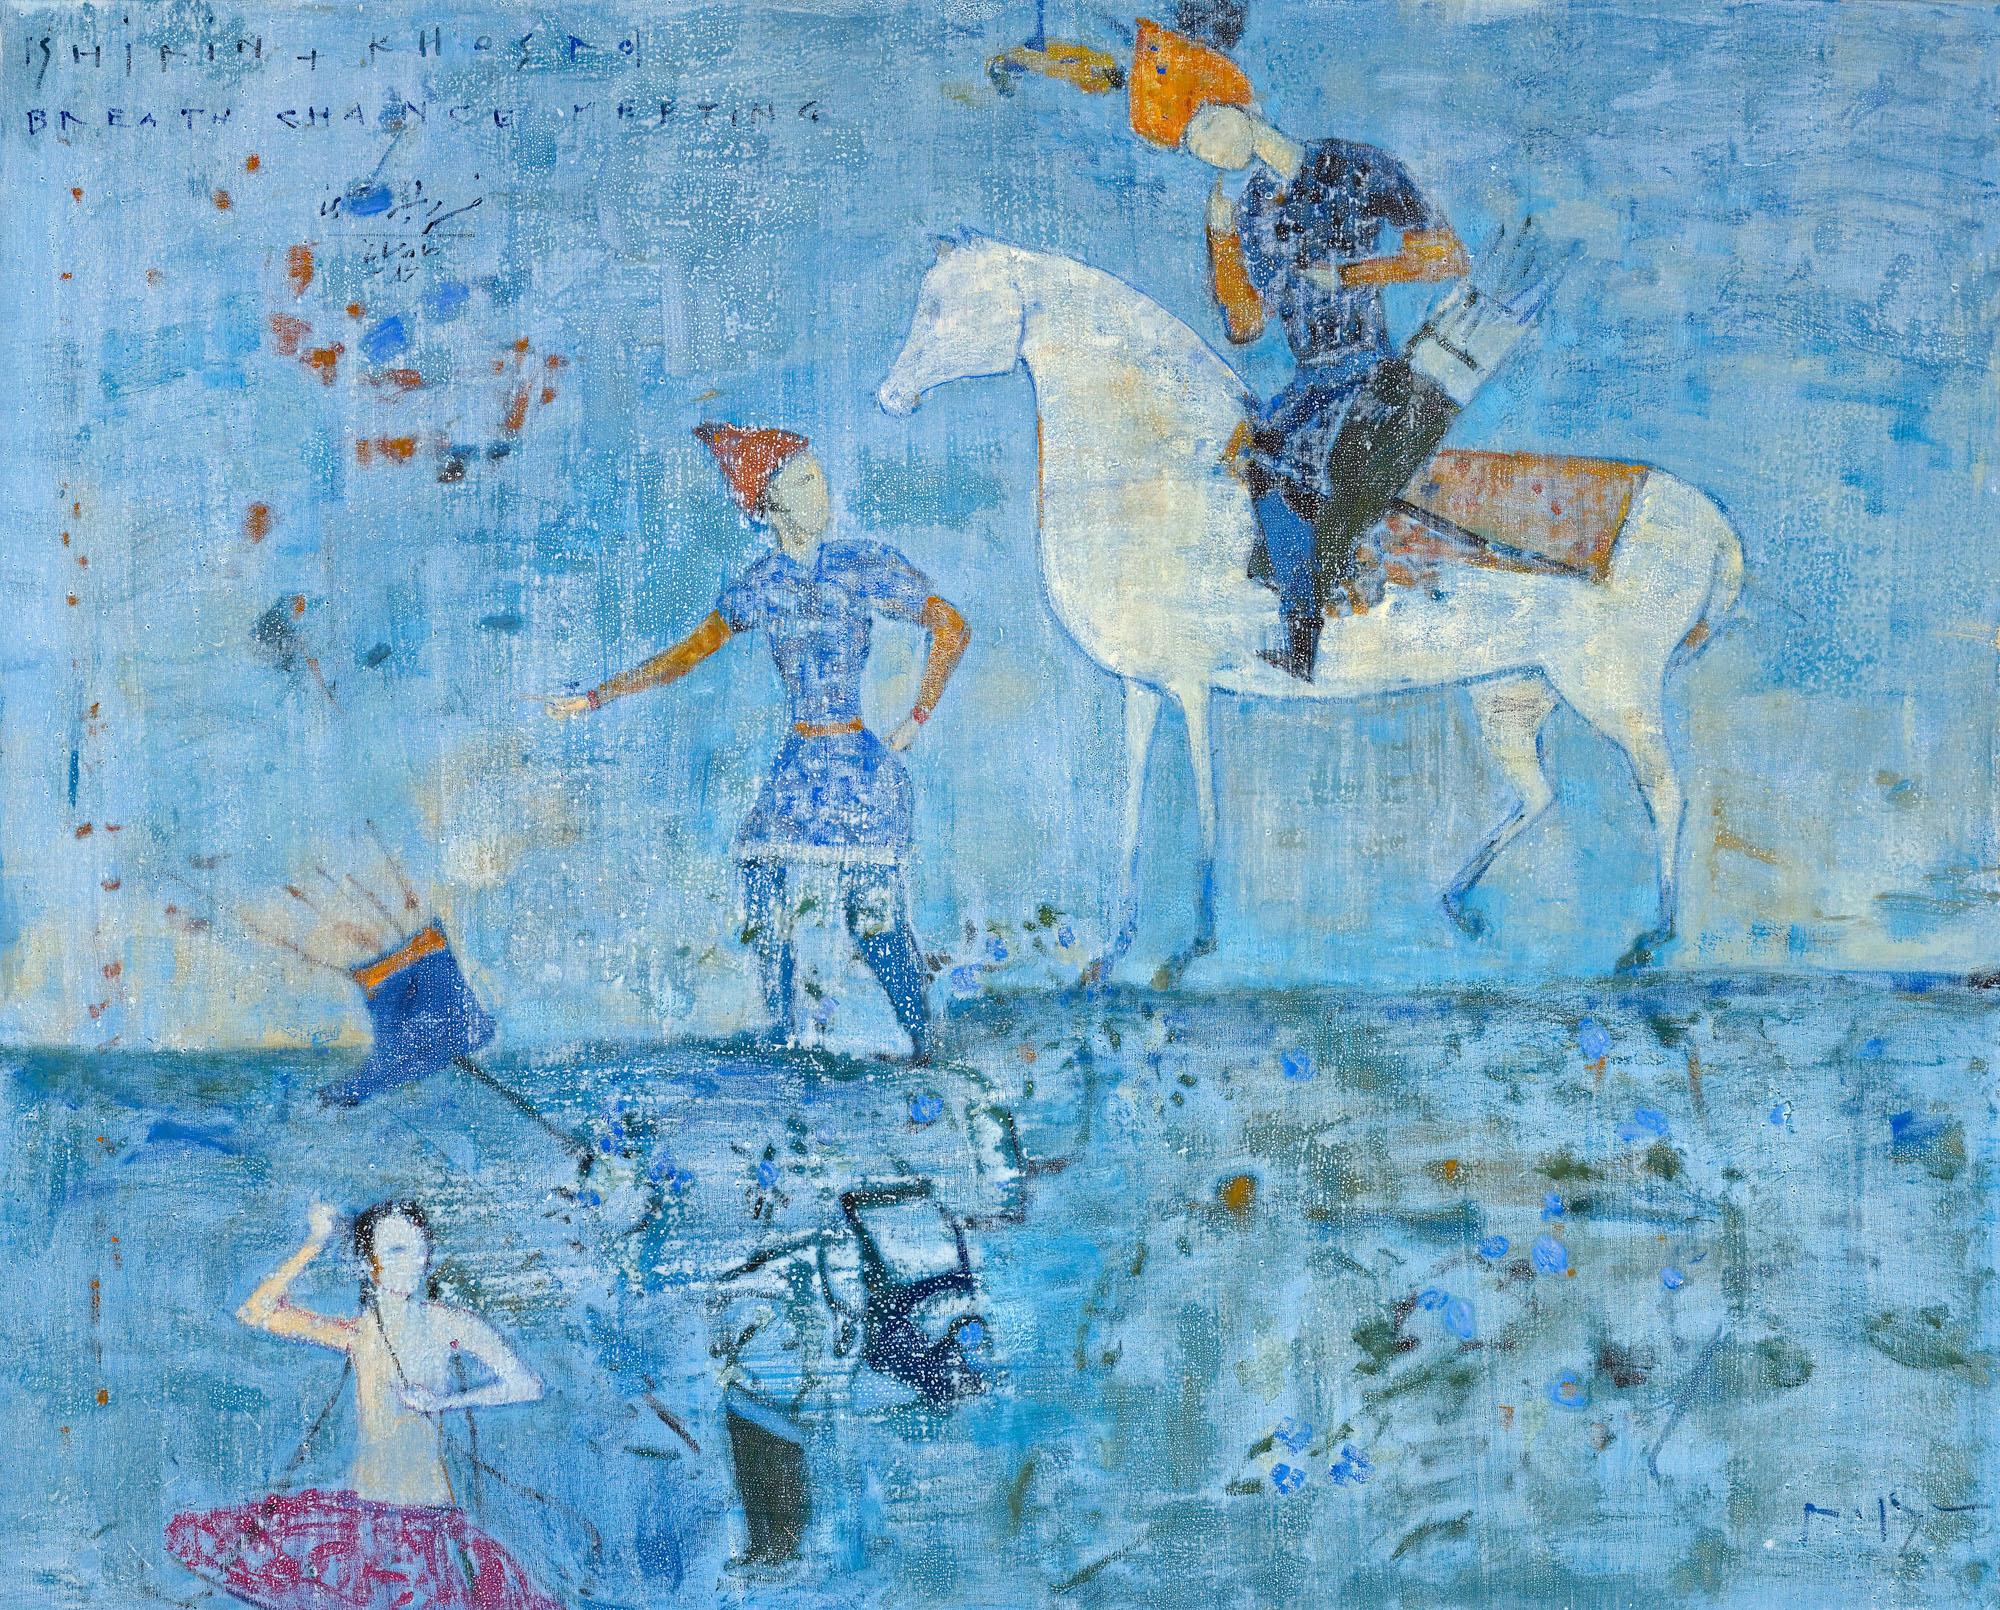 Reza Derakshani, Khosrow and Shirin Series, Mixed Media on Cavas, 120x150cm, 2009.jpg